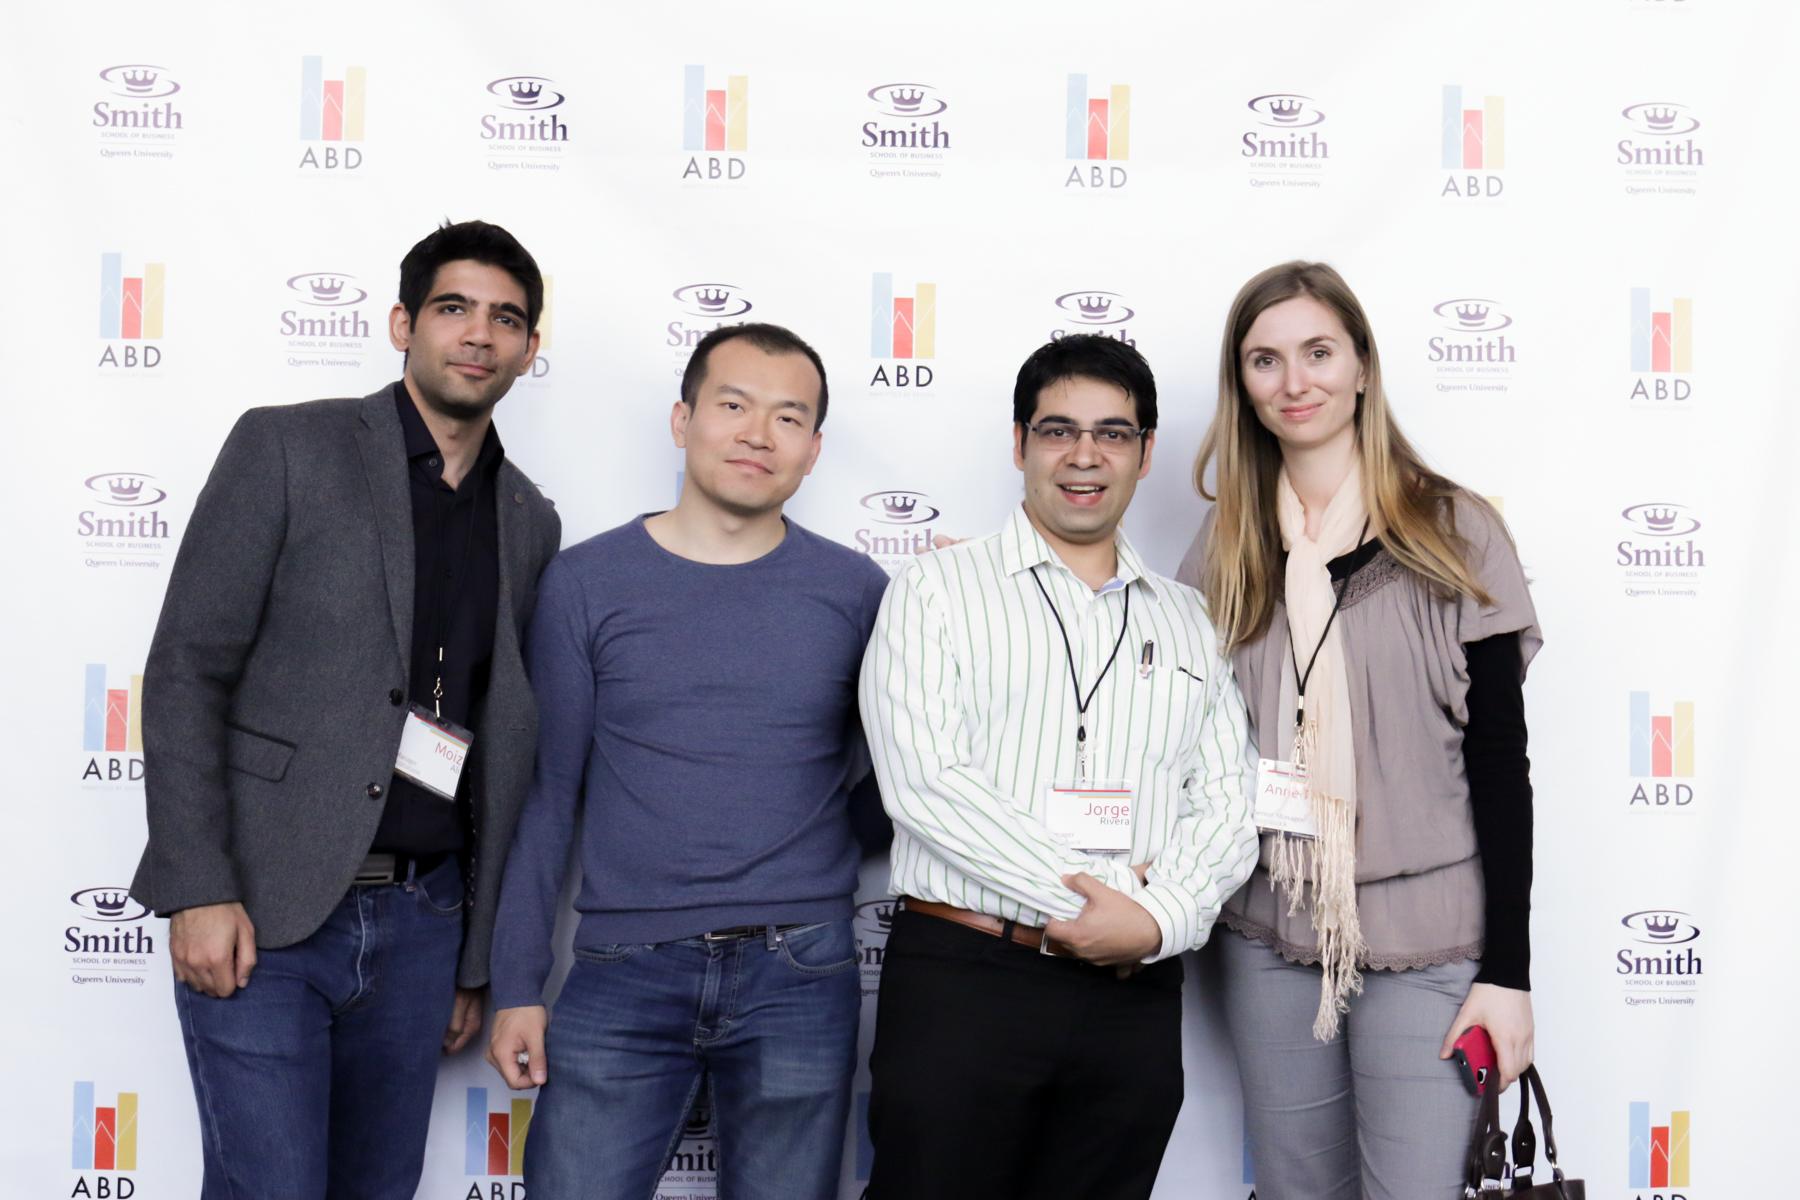 ABD_Conference_2018-109.jpg